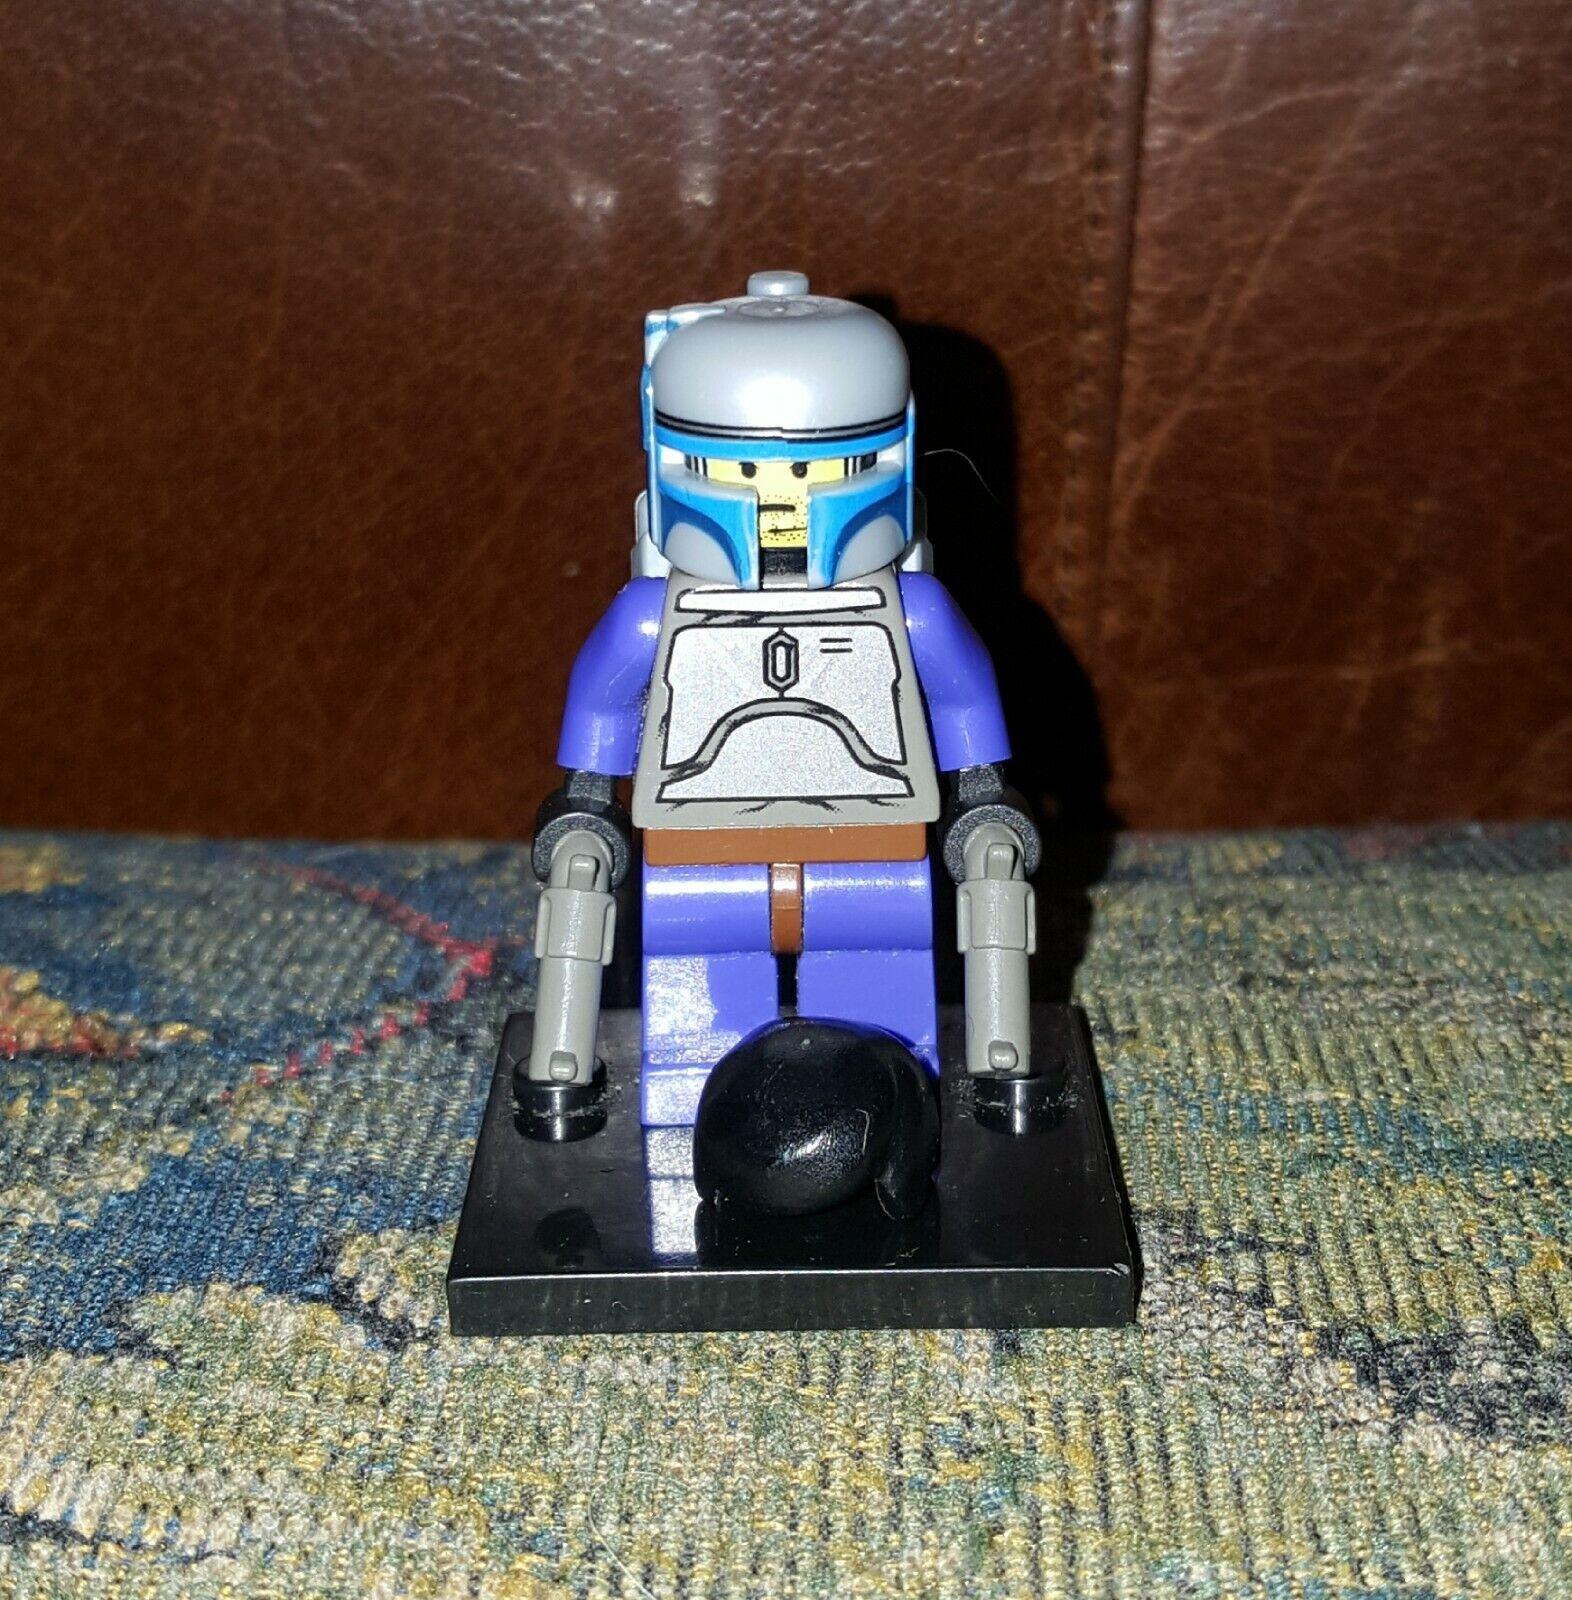 Authentic LEGO Stern Wars Original Jango Fett Minifigure sw053 7153 Bounty Hunter